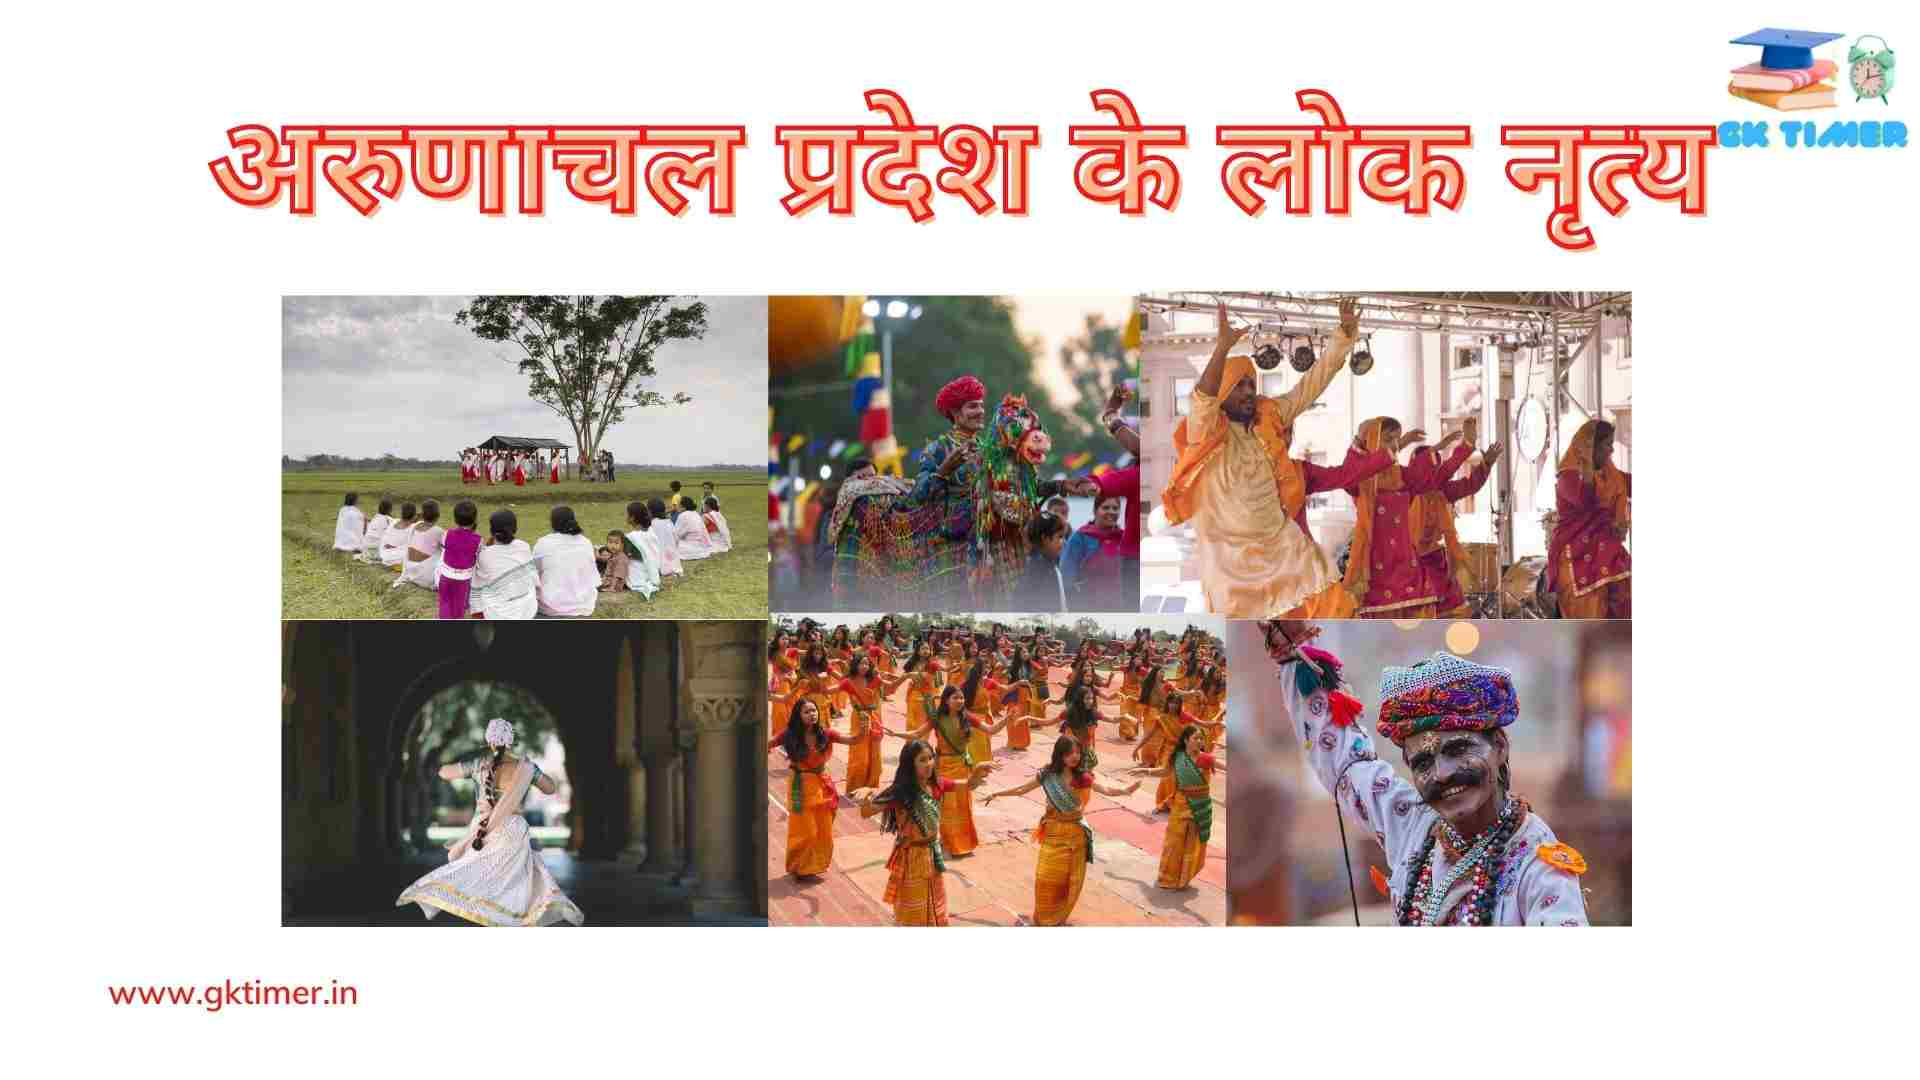 अरुणाचल प्रदेश का लोकप्रिय लोक नृत्य(बार्डो छम)   Bardo Chham -The popular folk dance of Arunachal Pradesh in Hindi